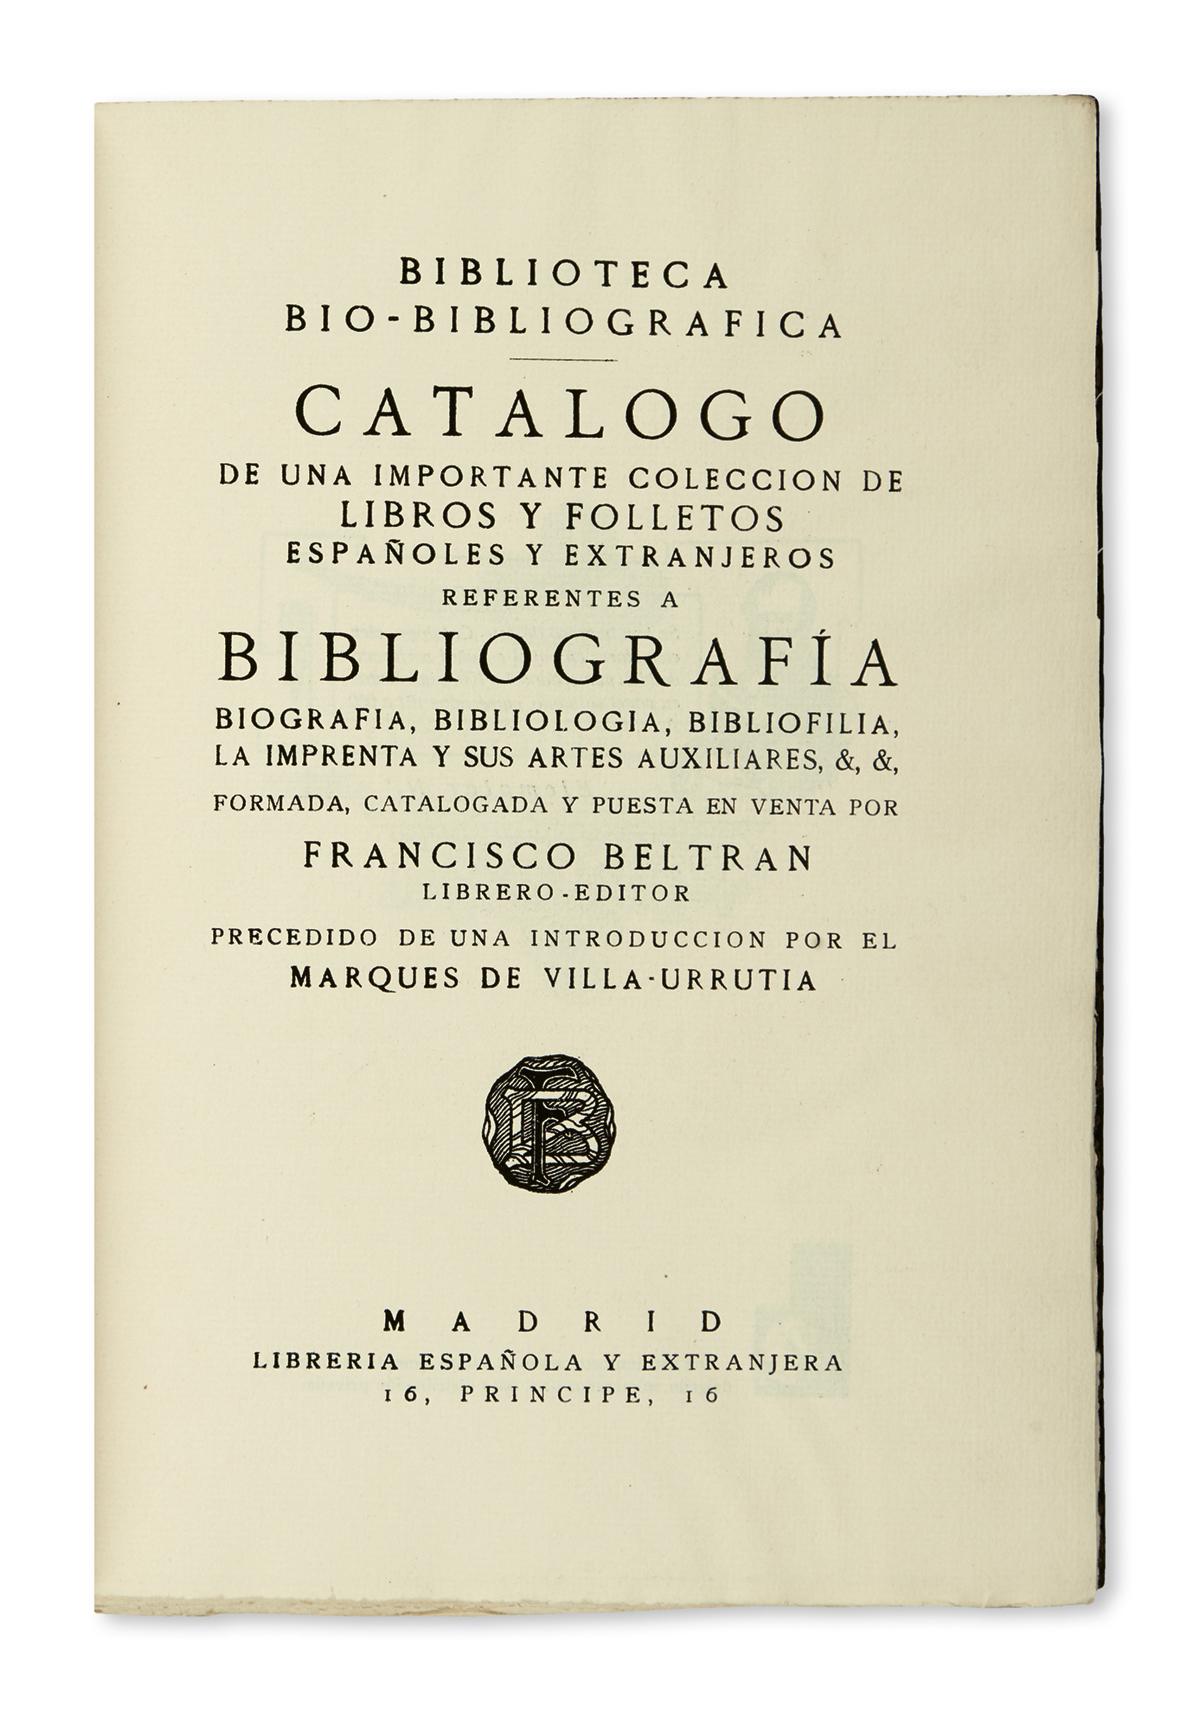 BELTRÁN-FRANCISCO-Biblioteca-Bio-Bibliográfica-Catálogo-de-u